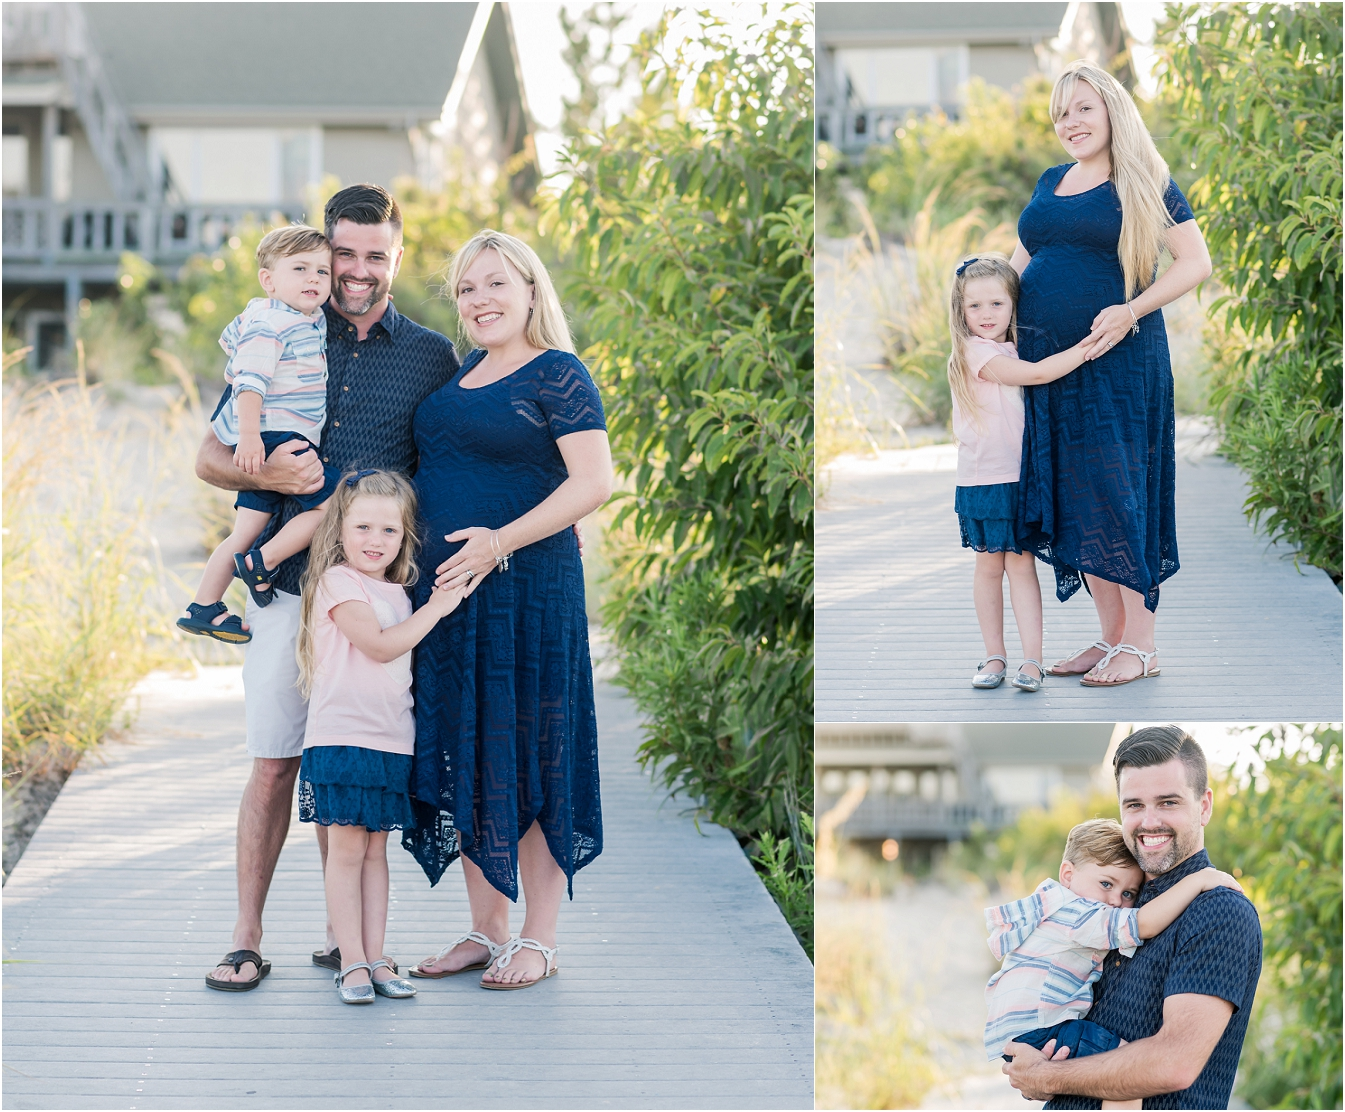 virginia beach family portraits, hampton roads portrait photographer, beach portrait sessions